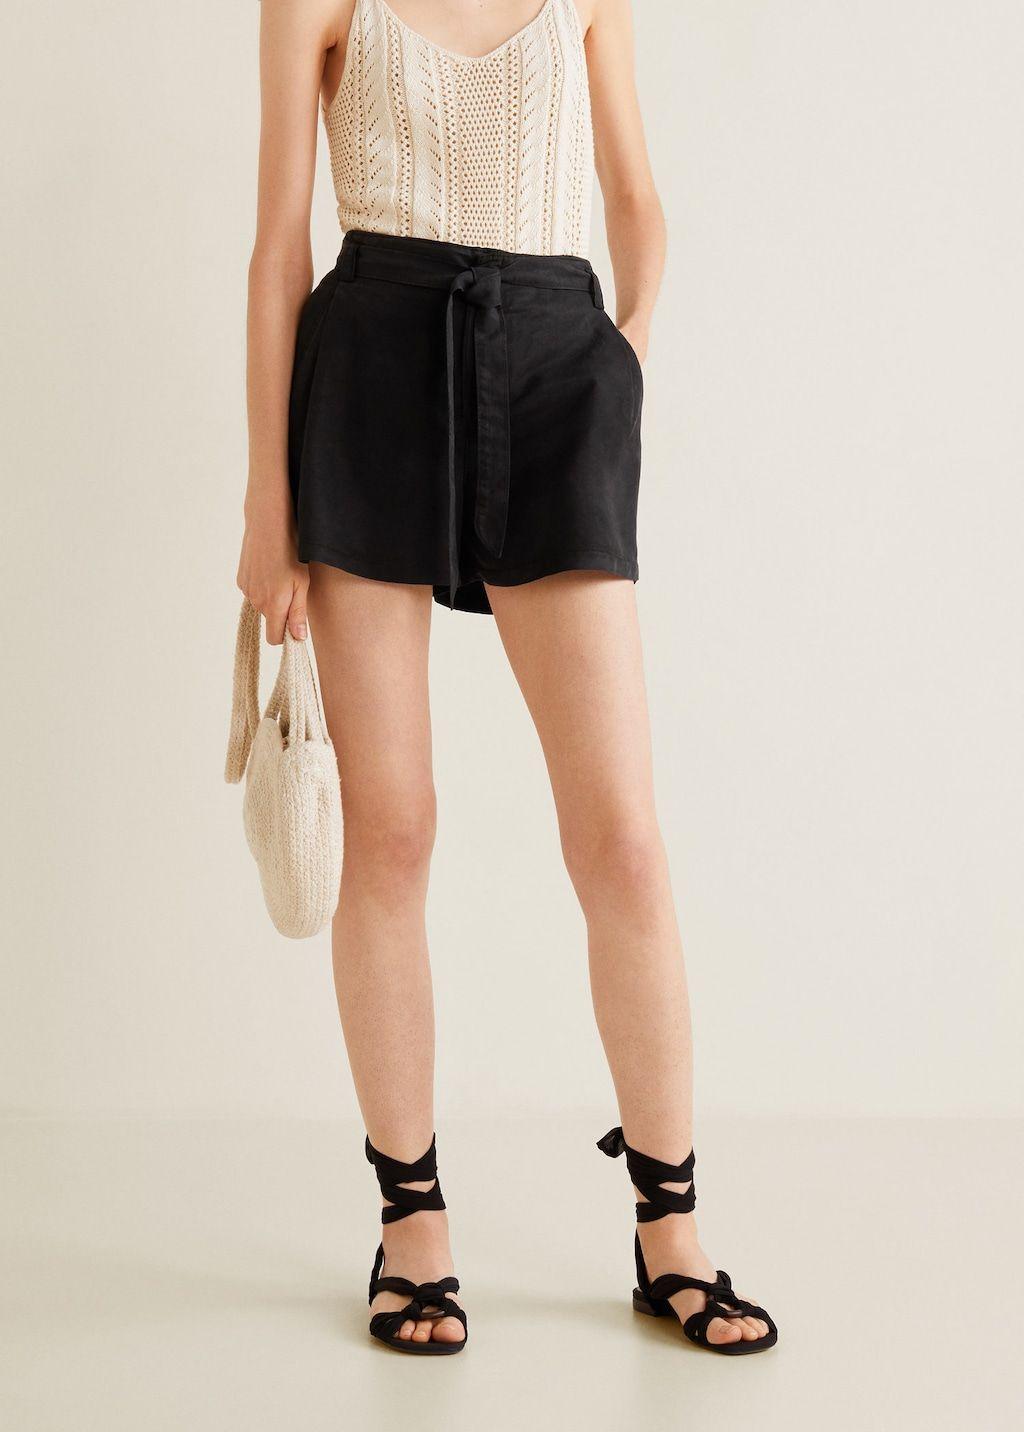 Stoffen Korte Broek Dames.Soft Shorts Dames Korte Broek Korte Broek Broeken